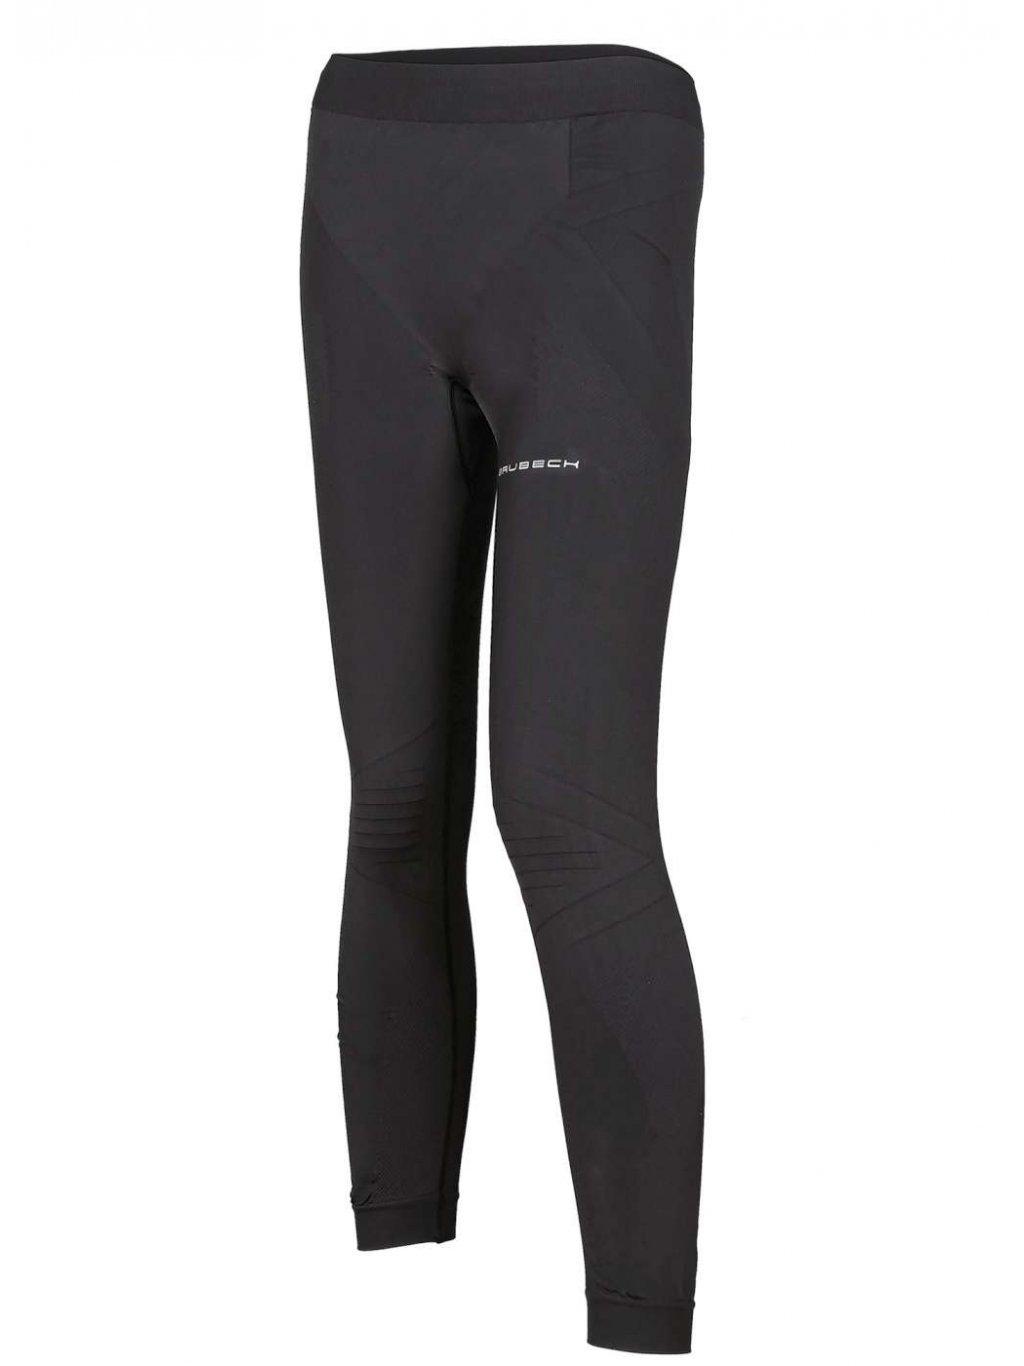 Brubeck dámské kalhoty RUNNING FORCE Athletic